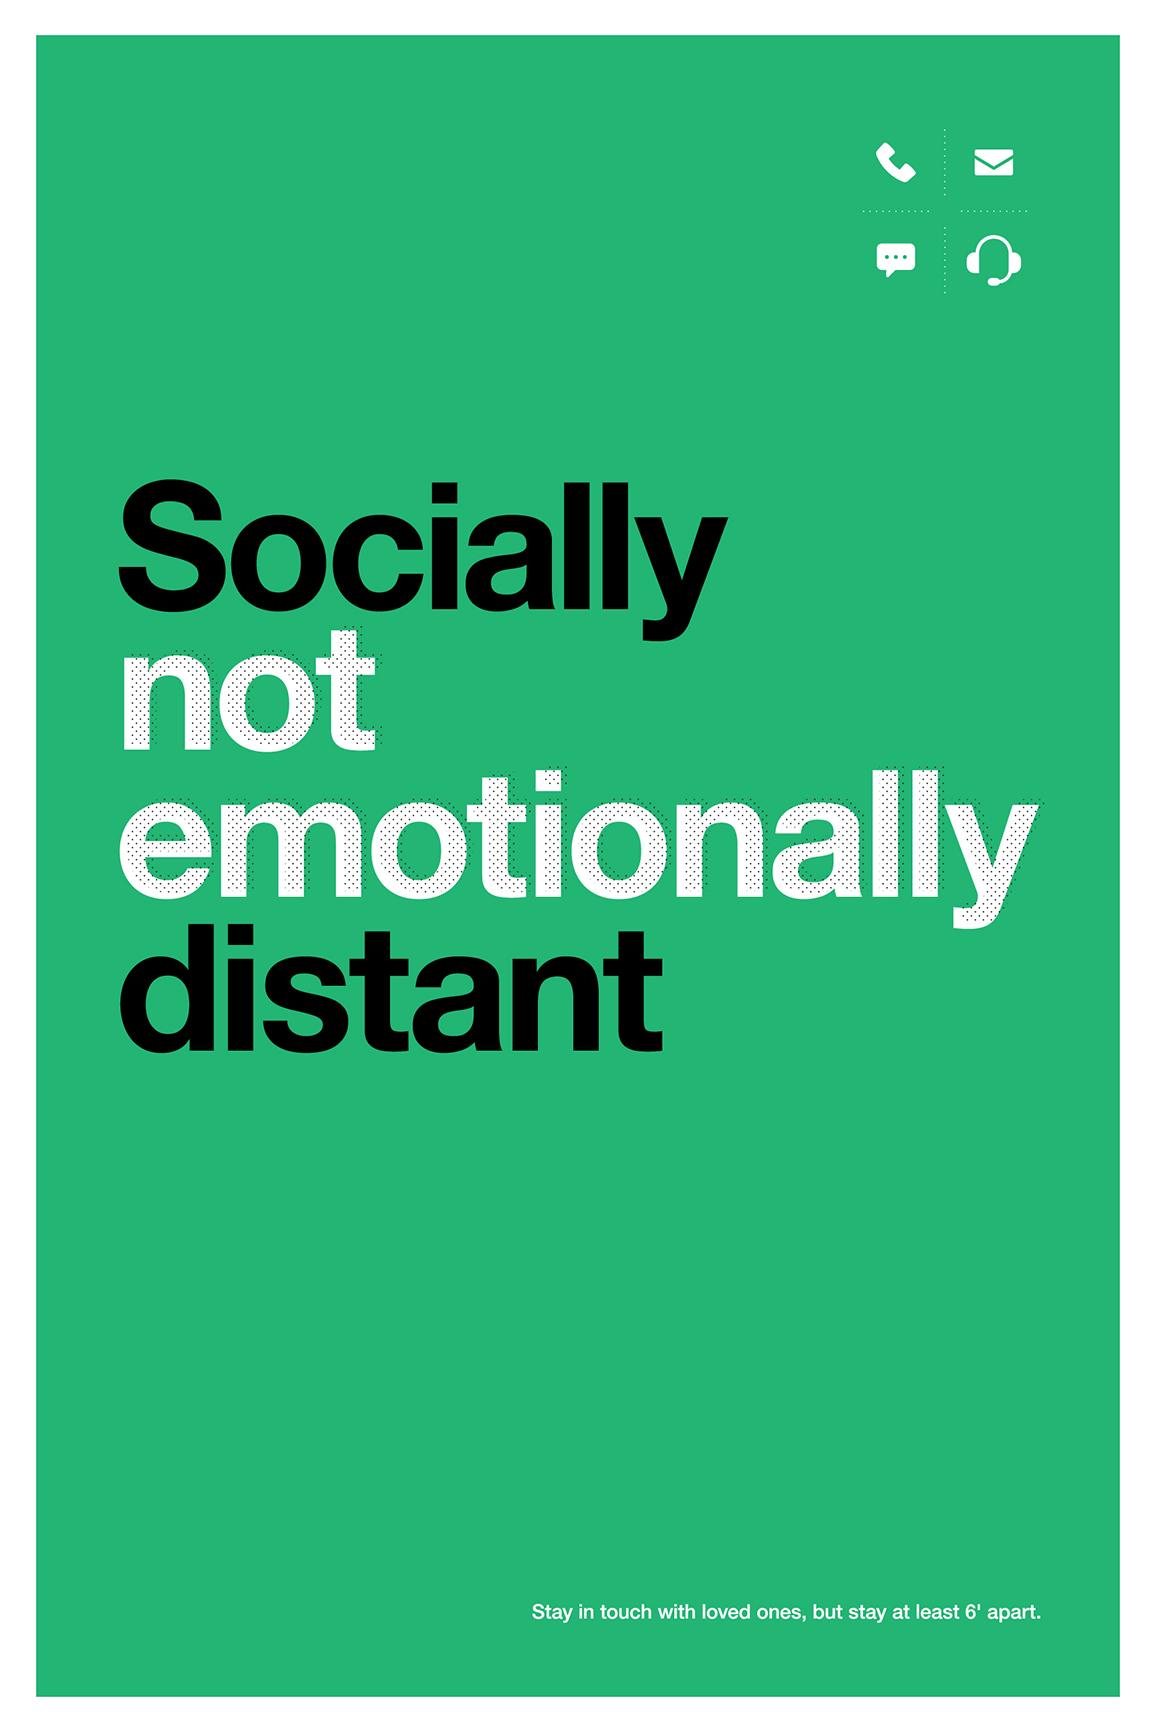 It's Social, Not Emotional.